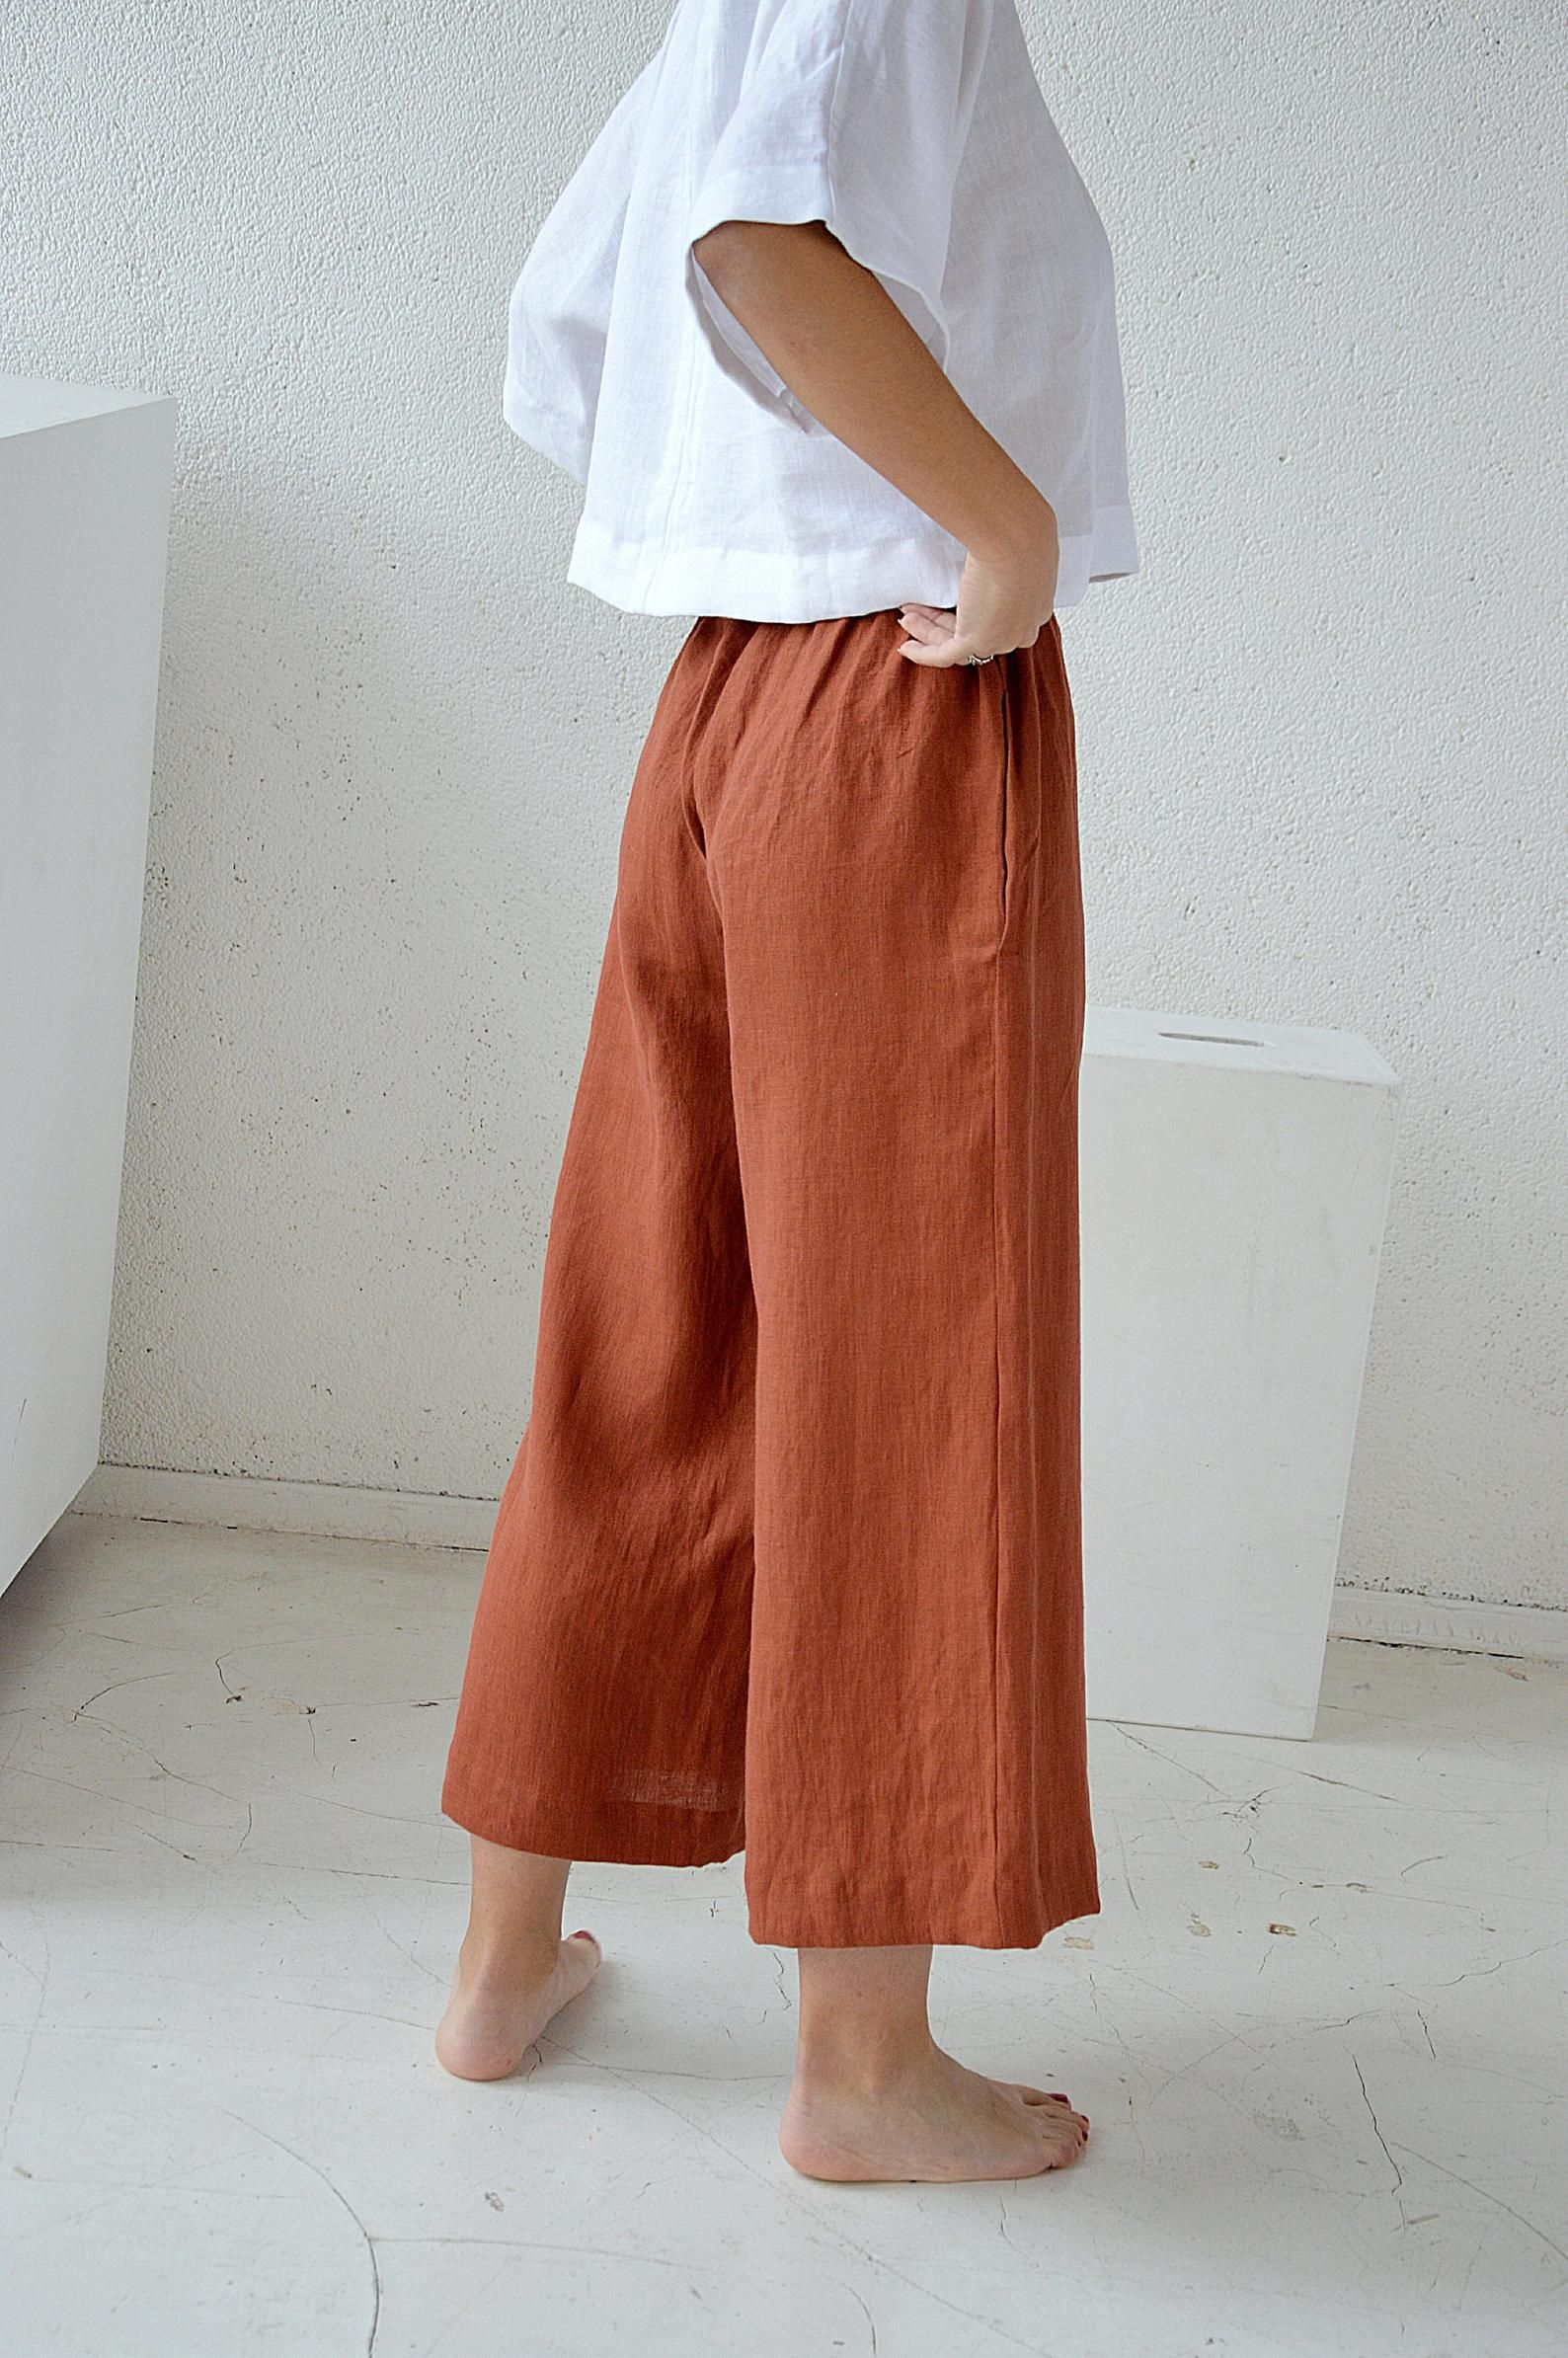 c6139139cfa Linen pants / Culottes linen pants / Terracotta linen culottes pants /  Loose pants / Midi